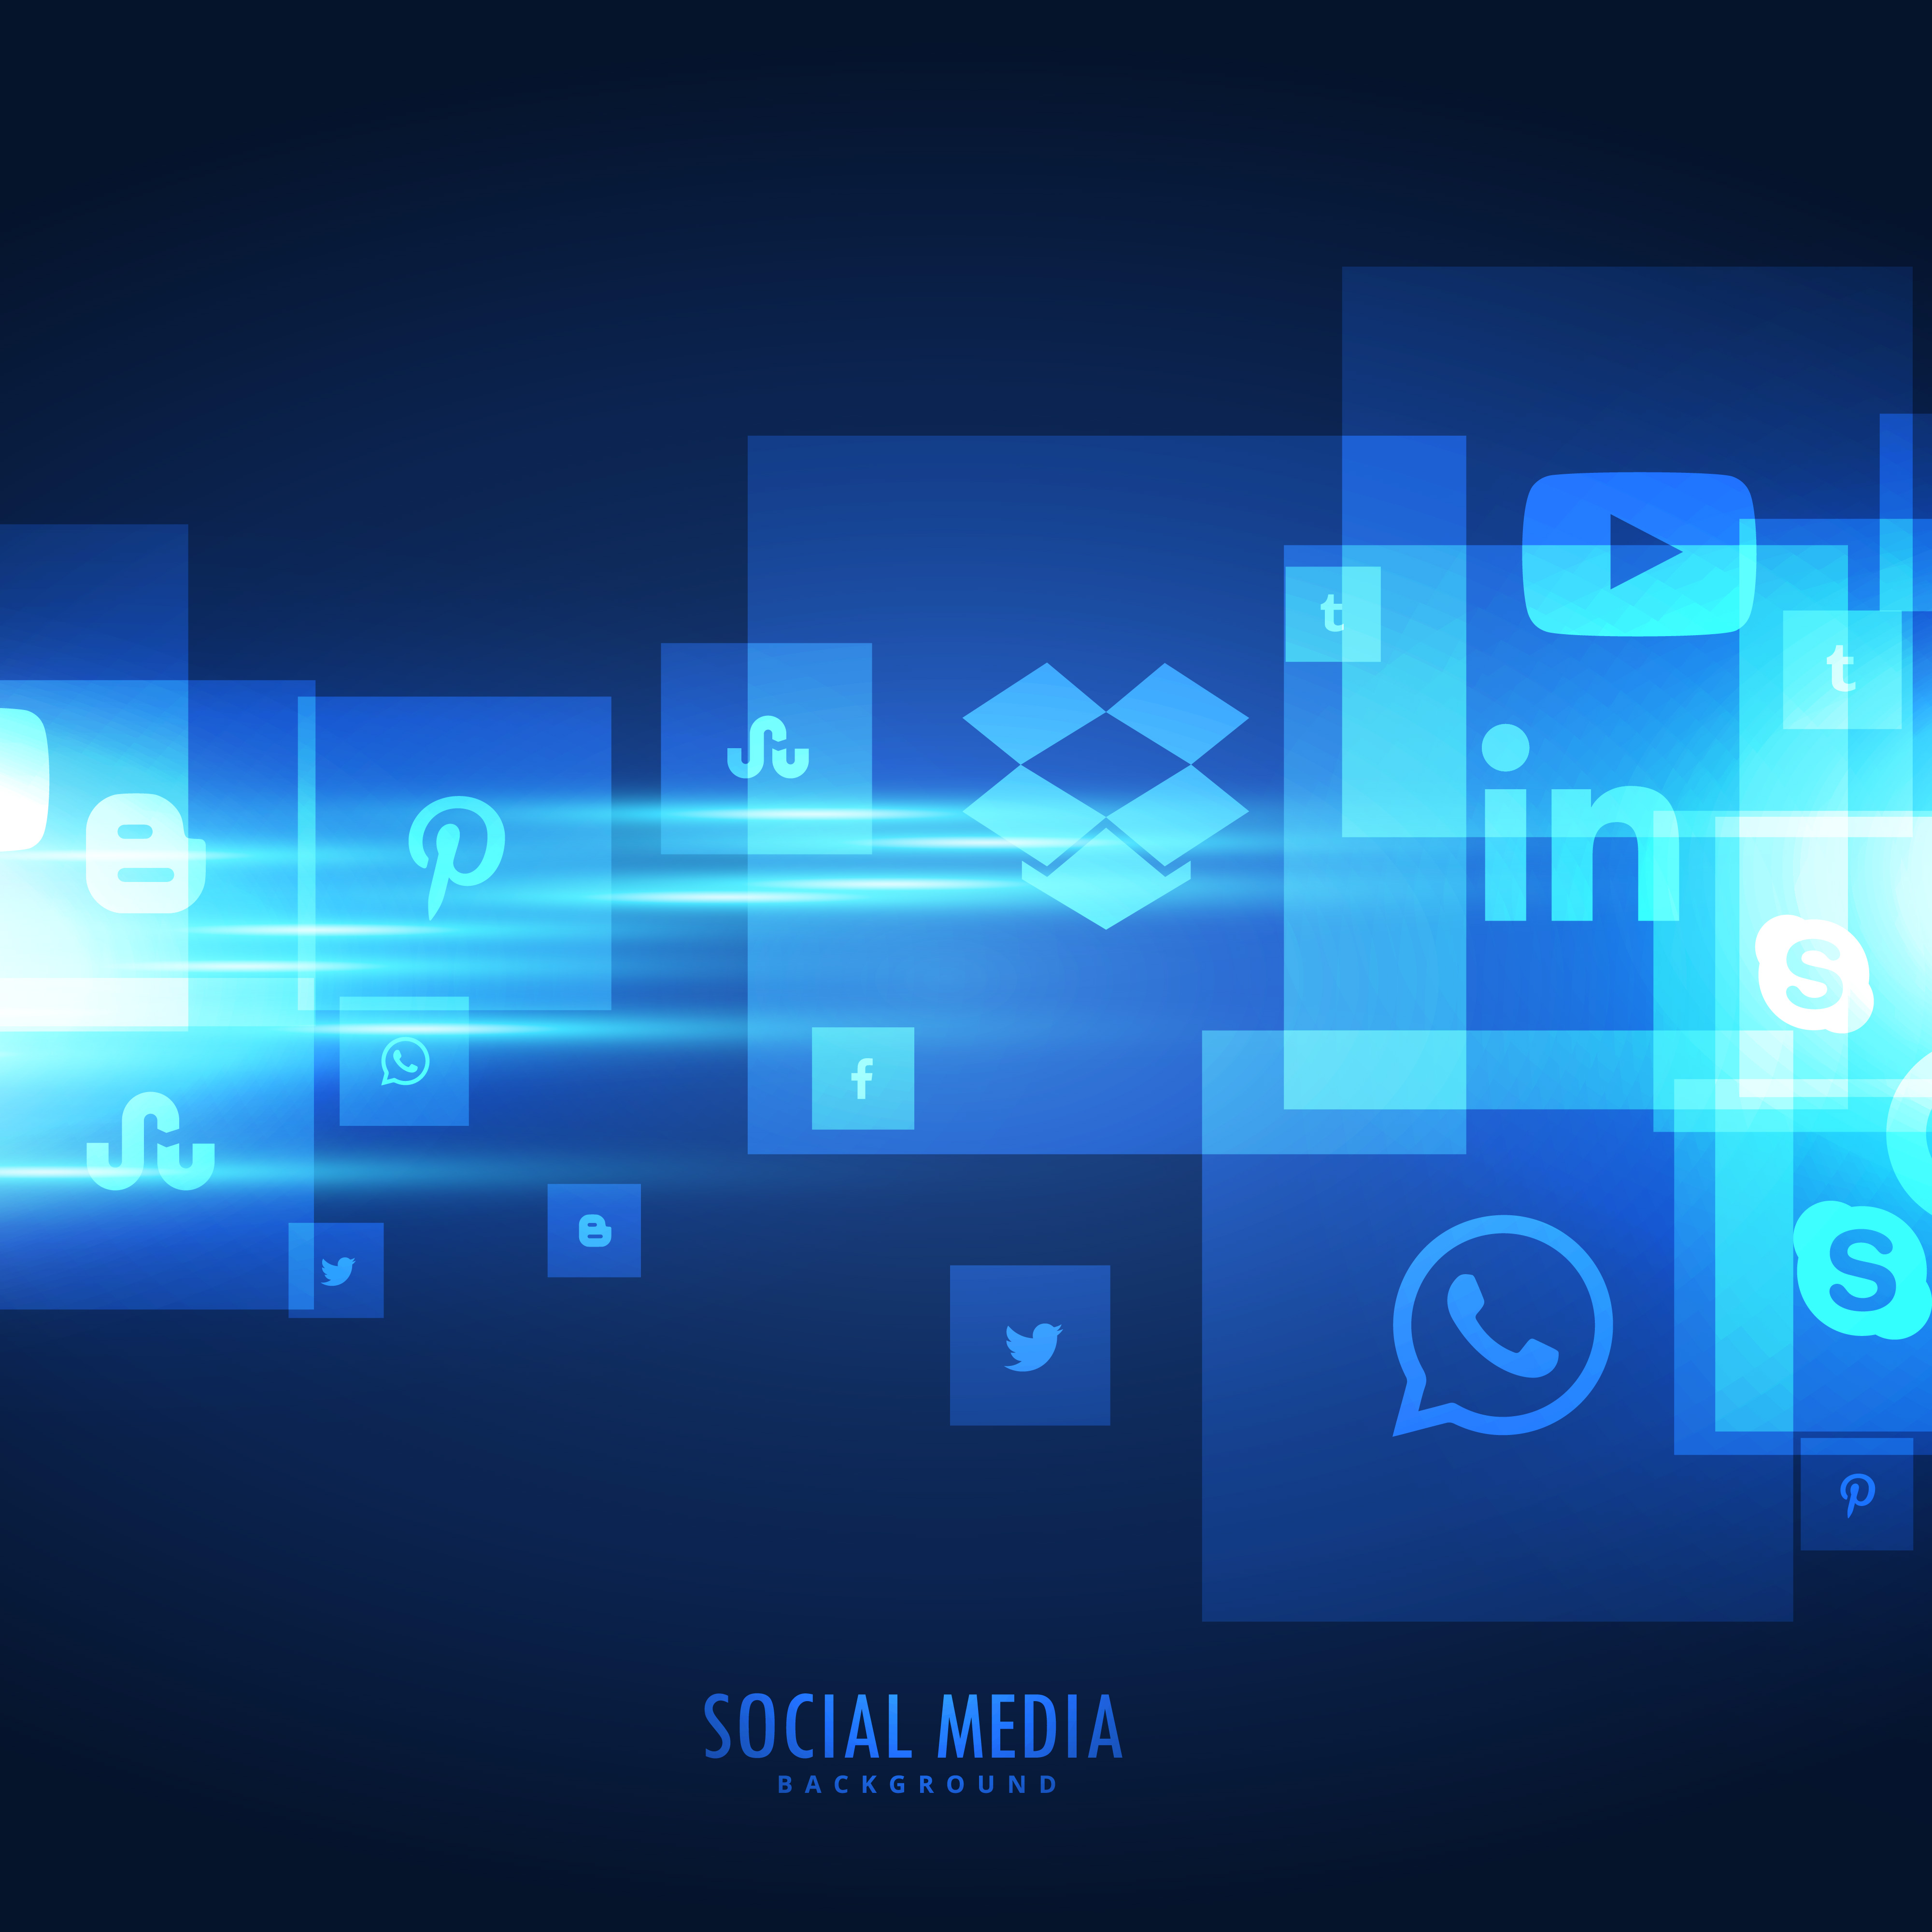 blue-social-media-icons-background-vector.jpg